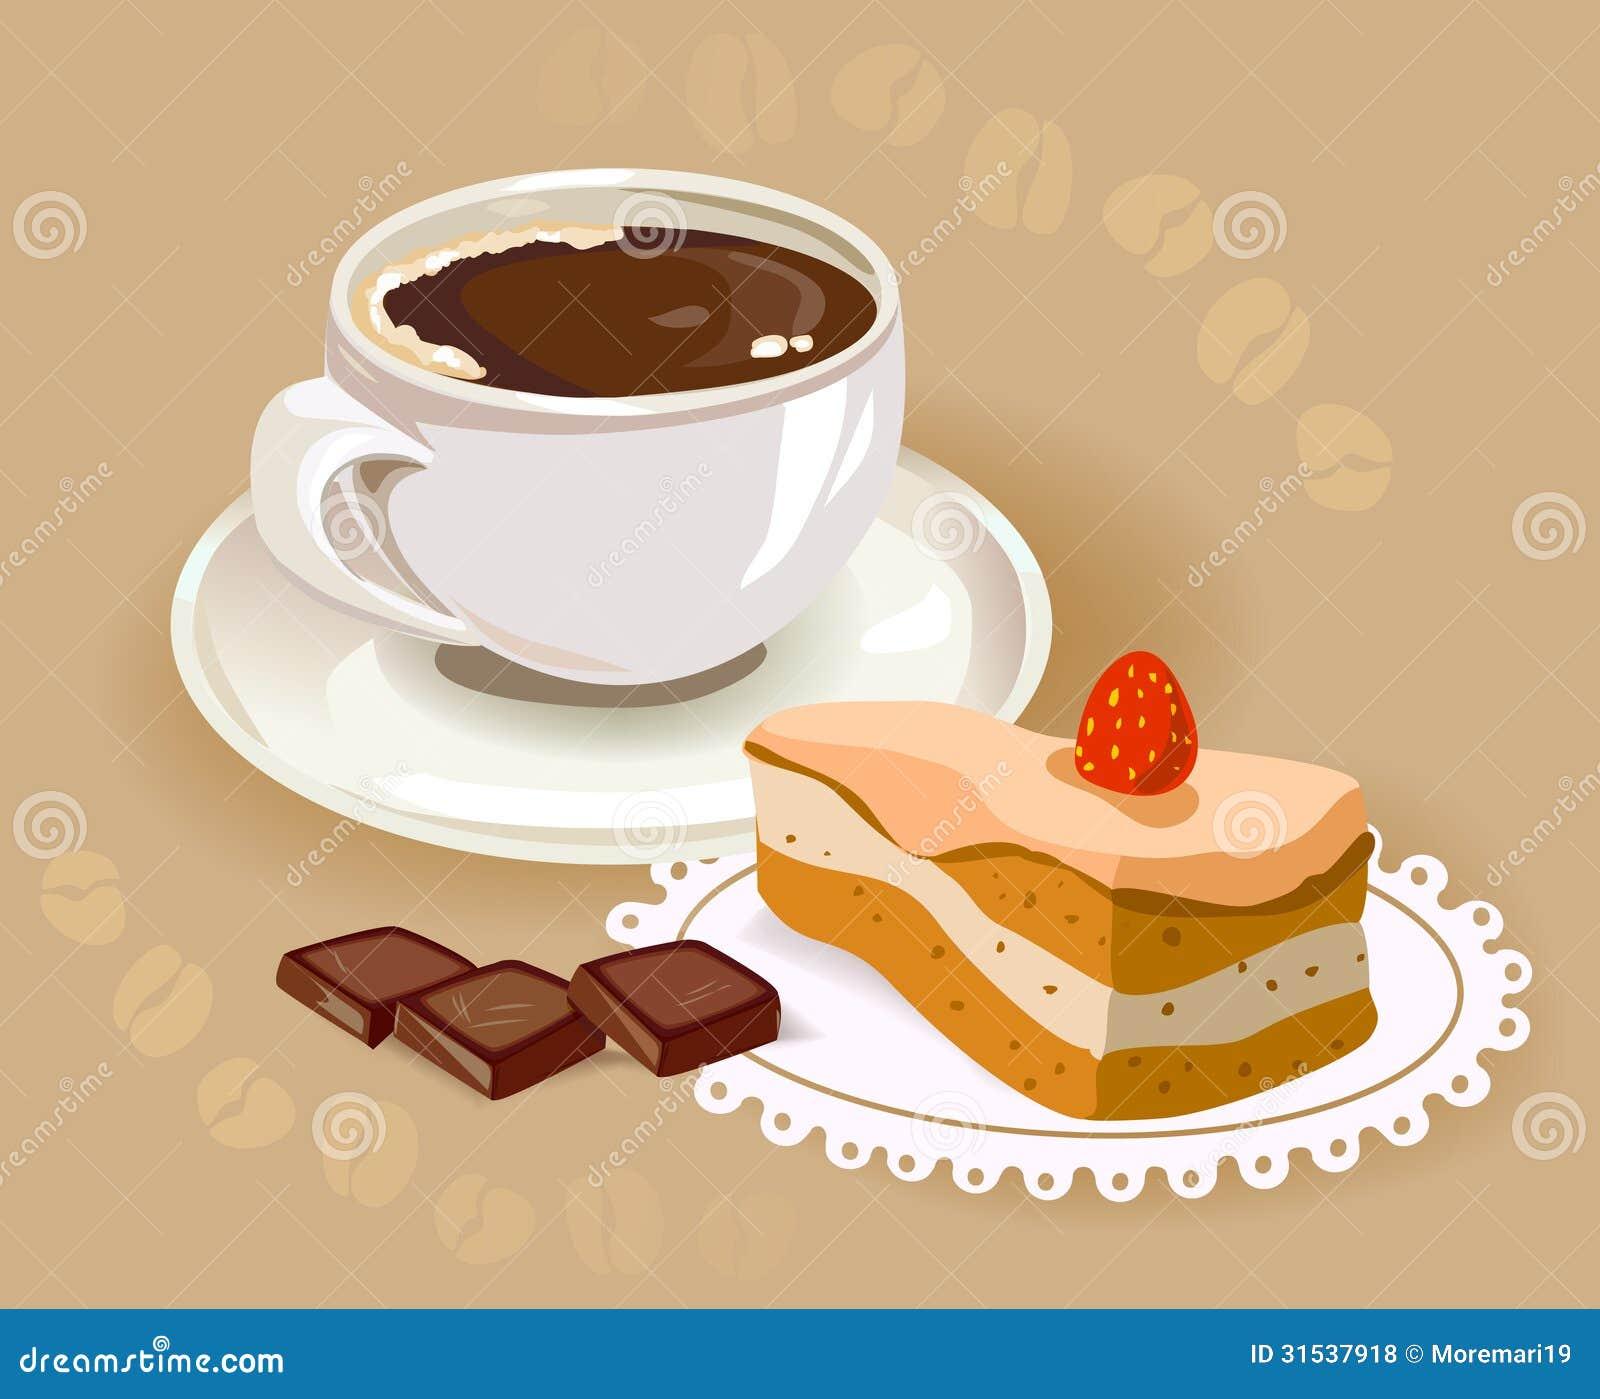 coffee break french pdf free download